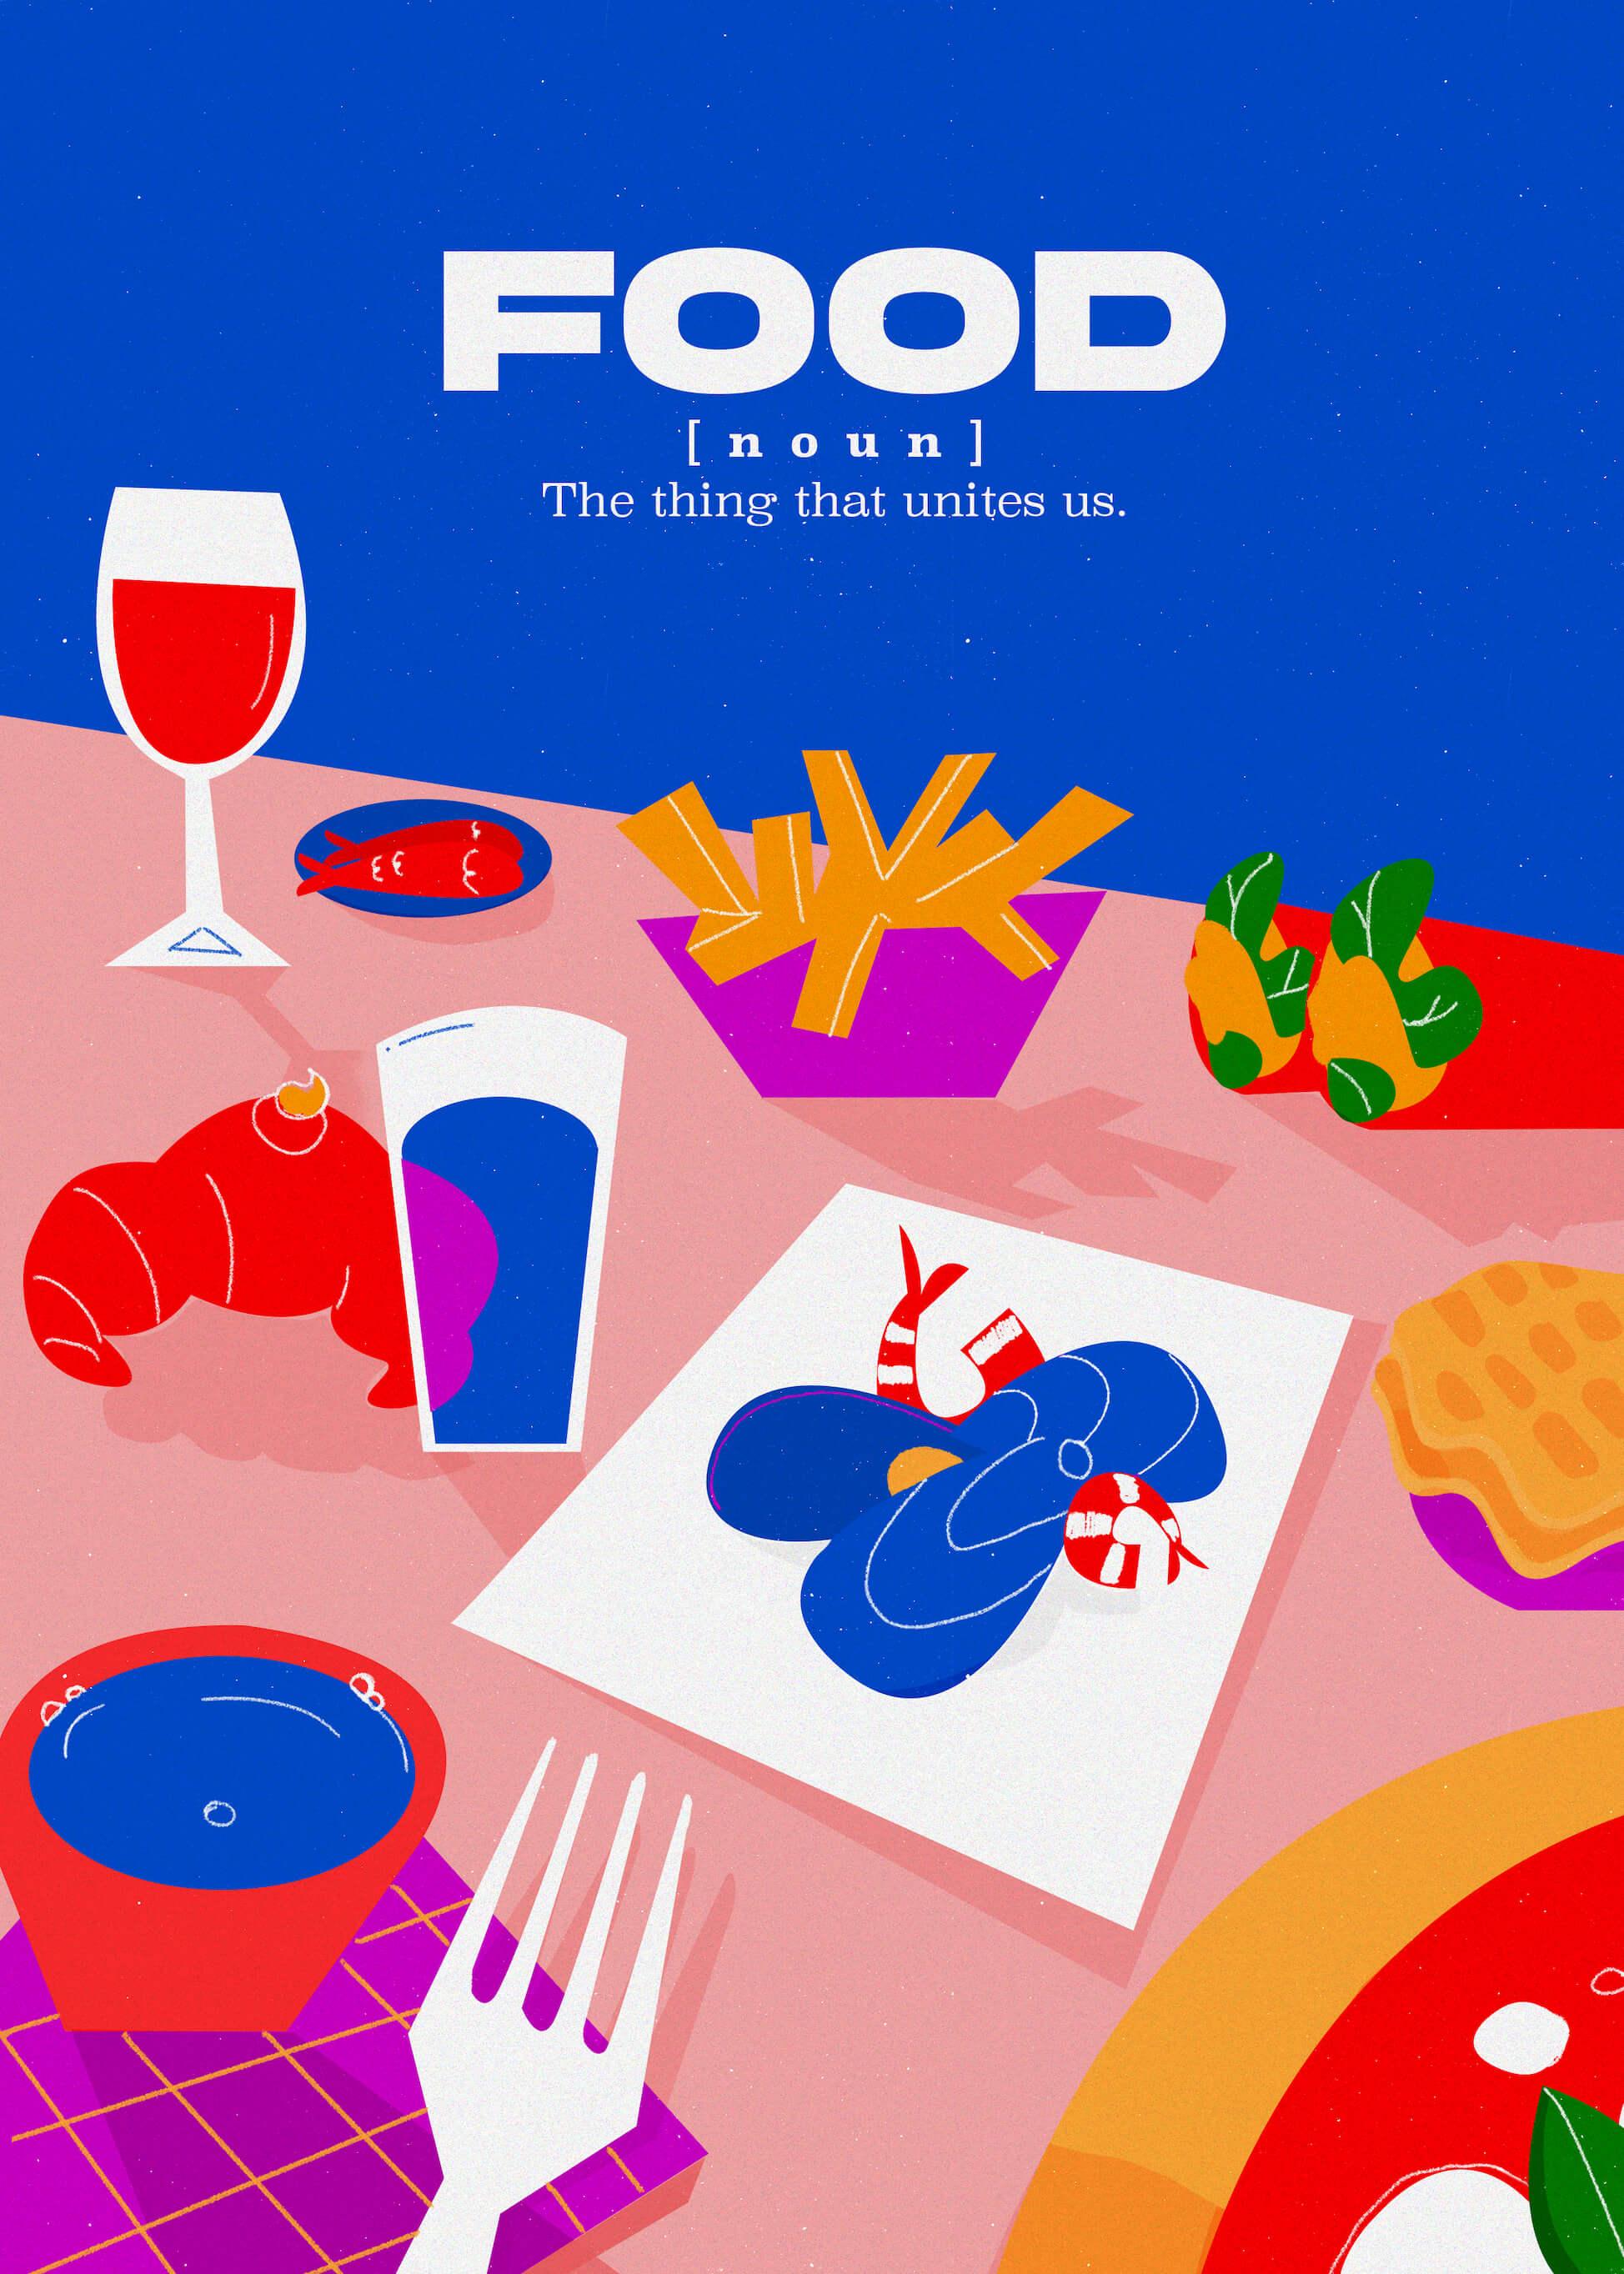 Food - The Thing That Unites Us main image